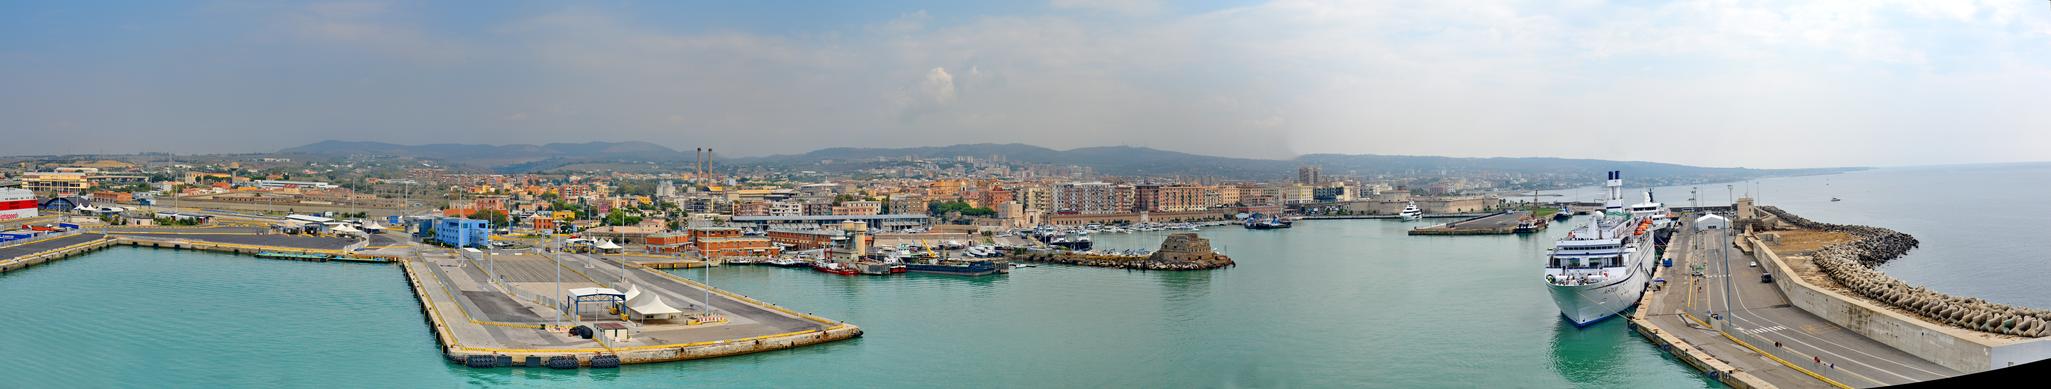 Civitavecchia Panorama by Travelie